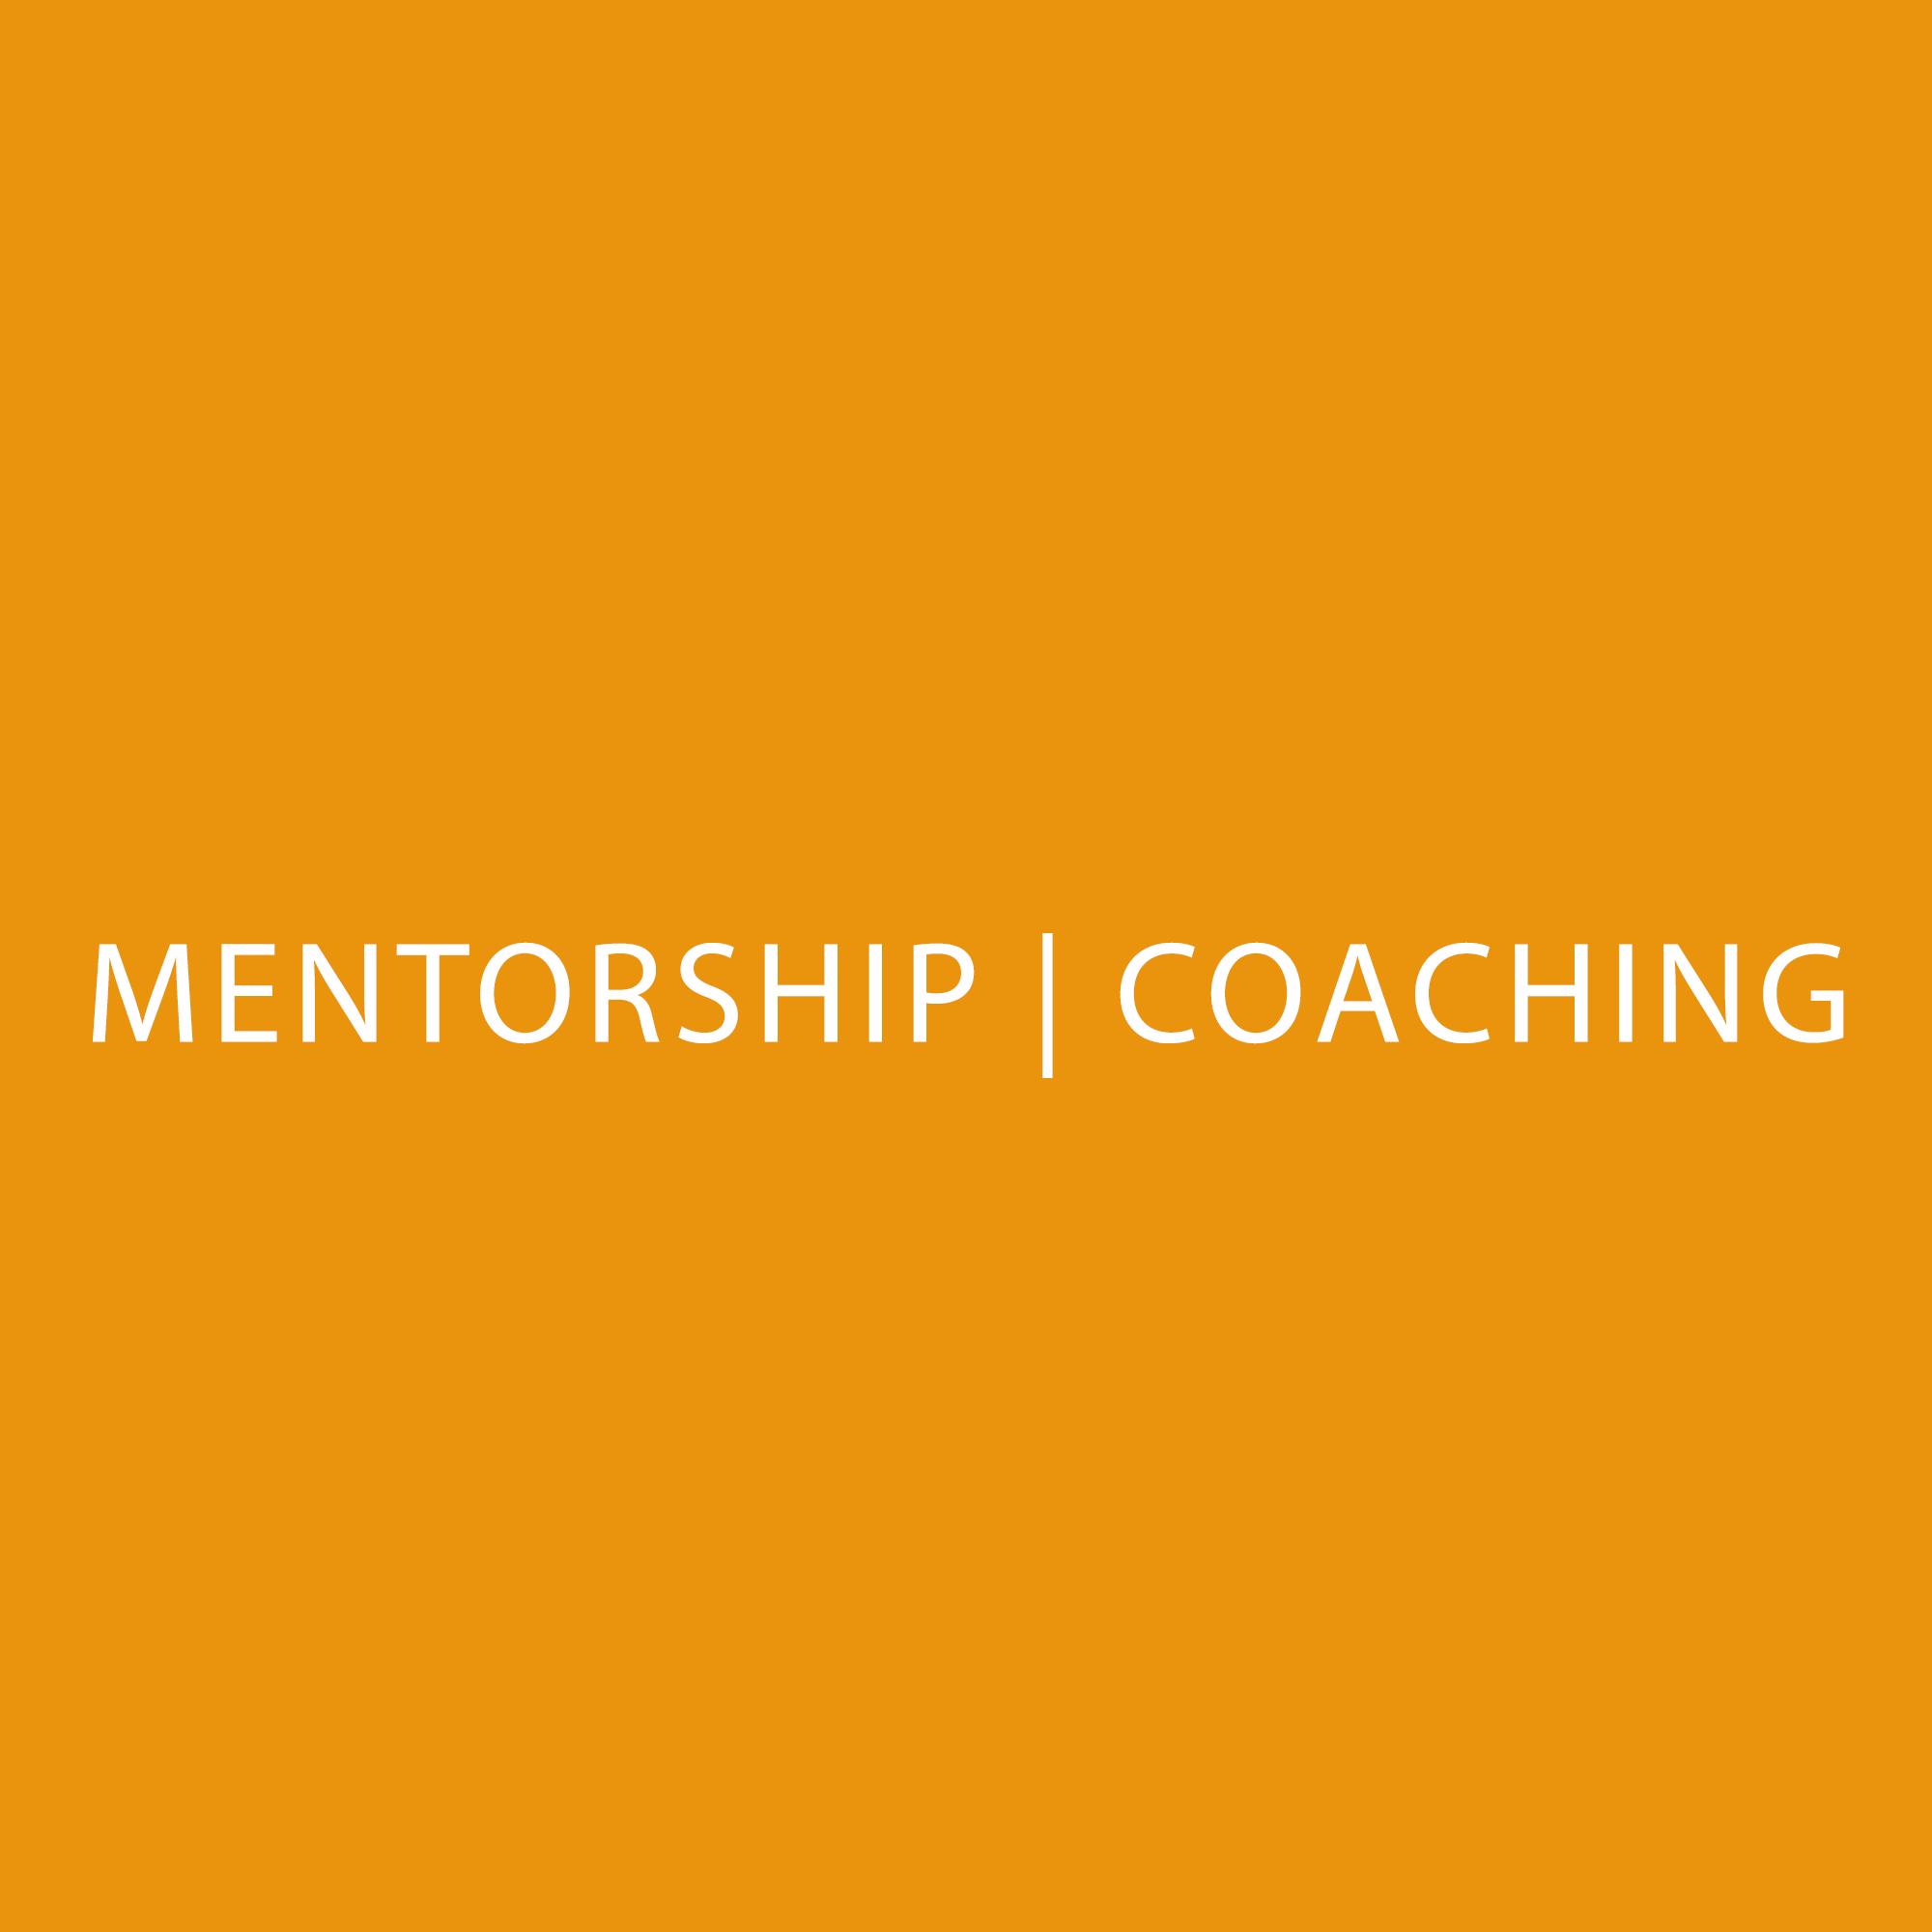 card_mentorship_01.png